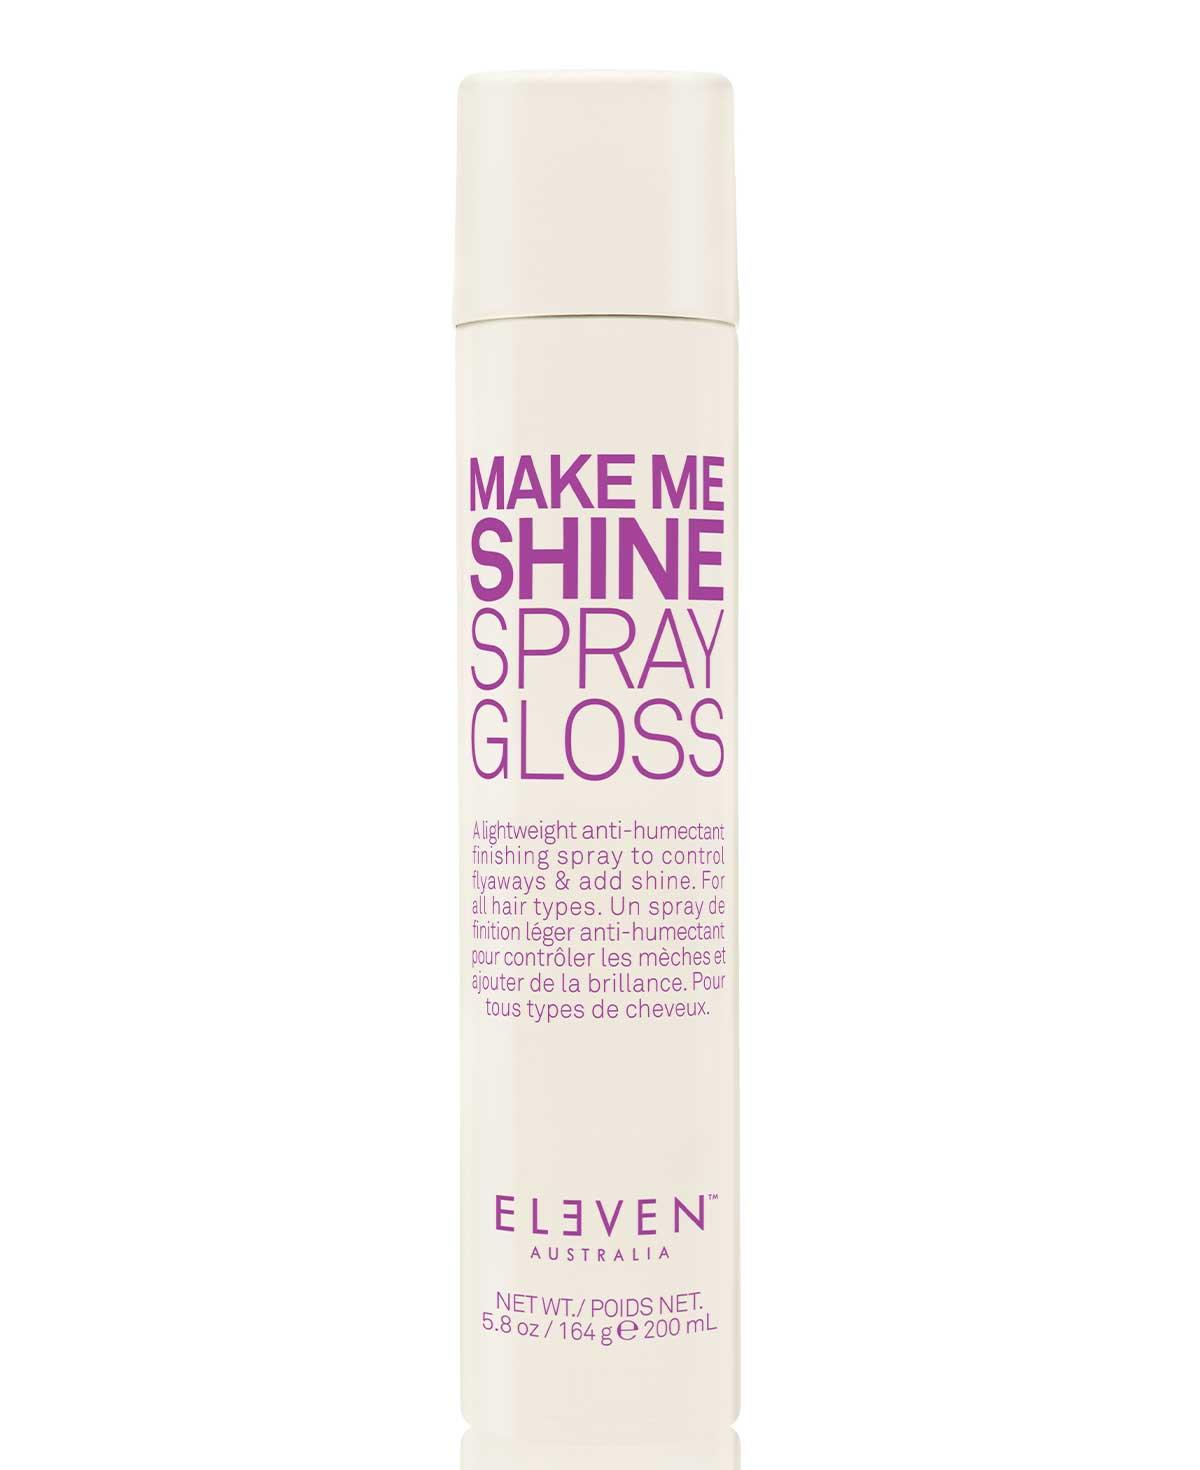 Eleven Make Me Shine Spray Gloss 200ml